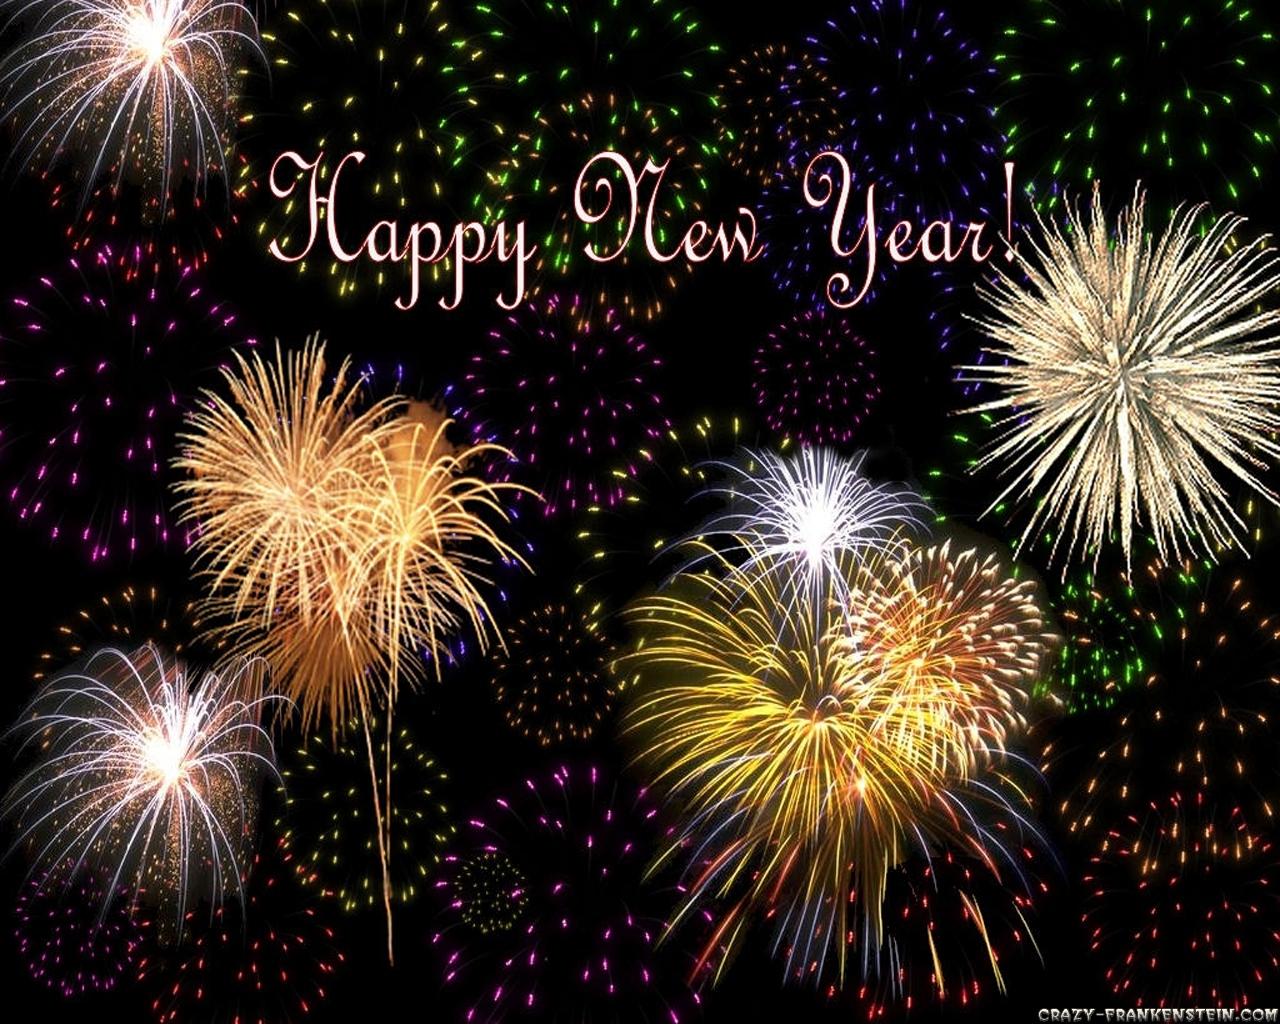 happy new year wallpaper live, desktop, background, screensaver